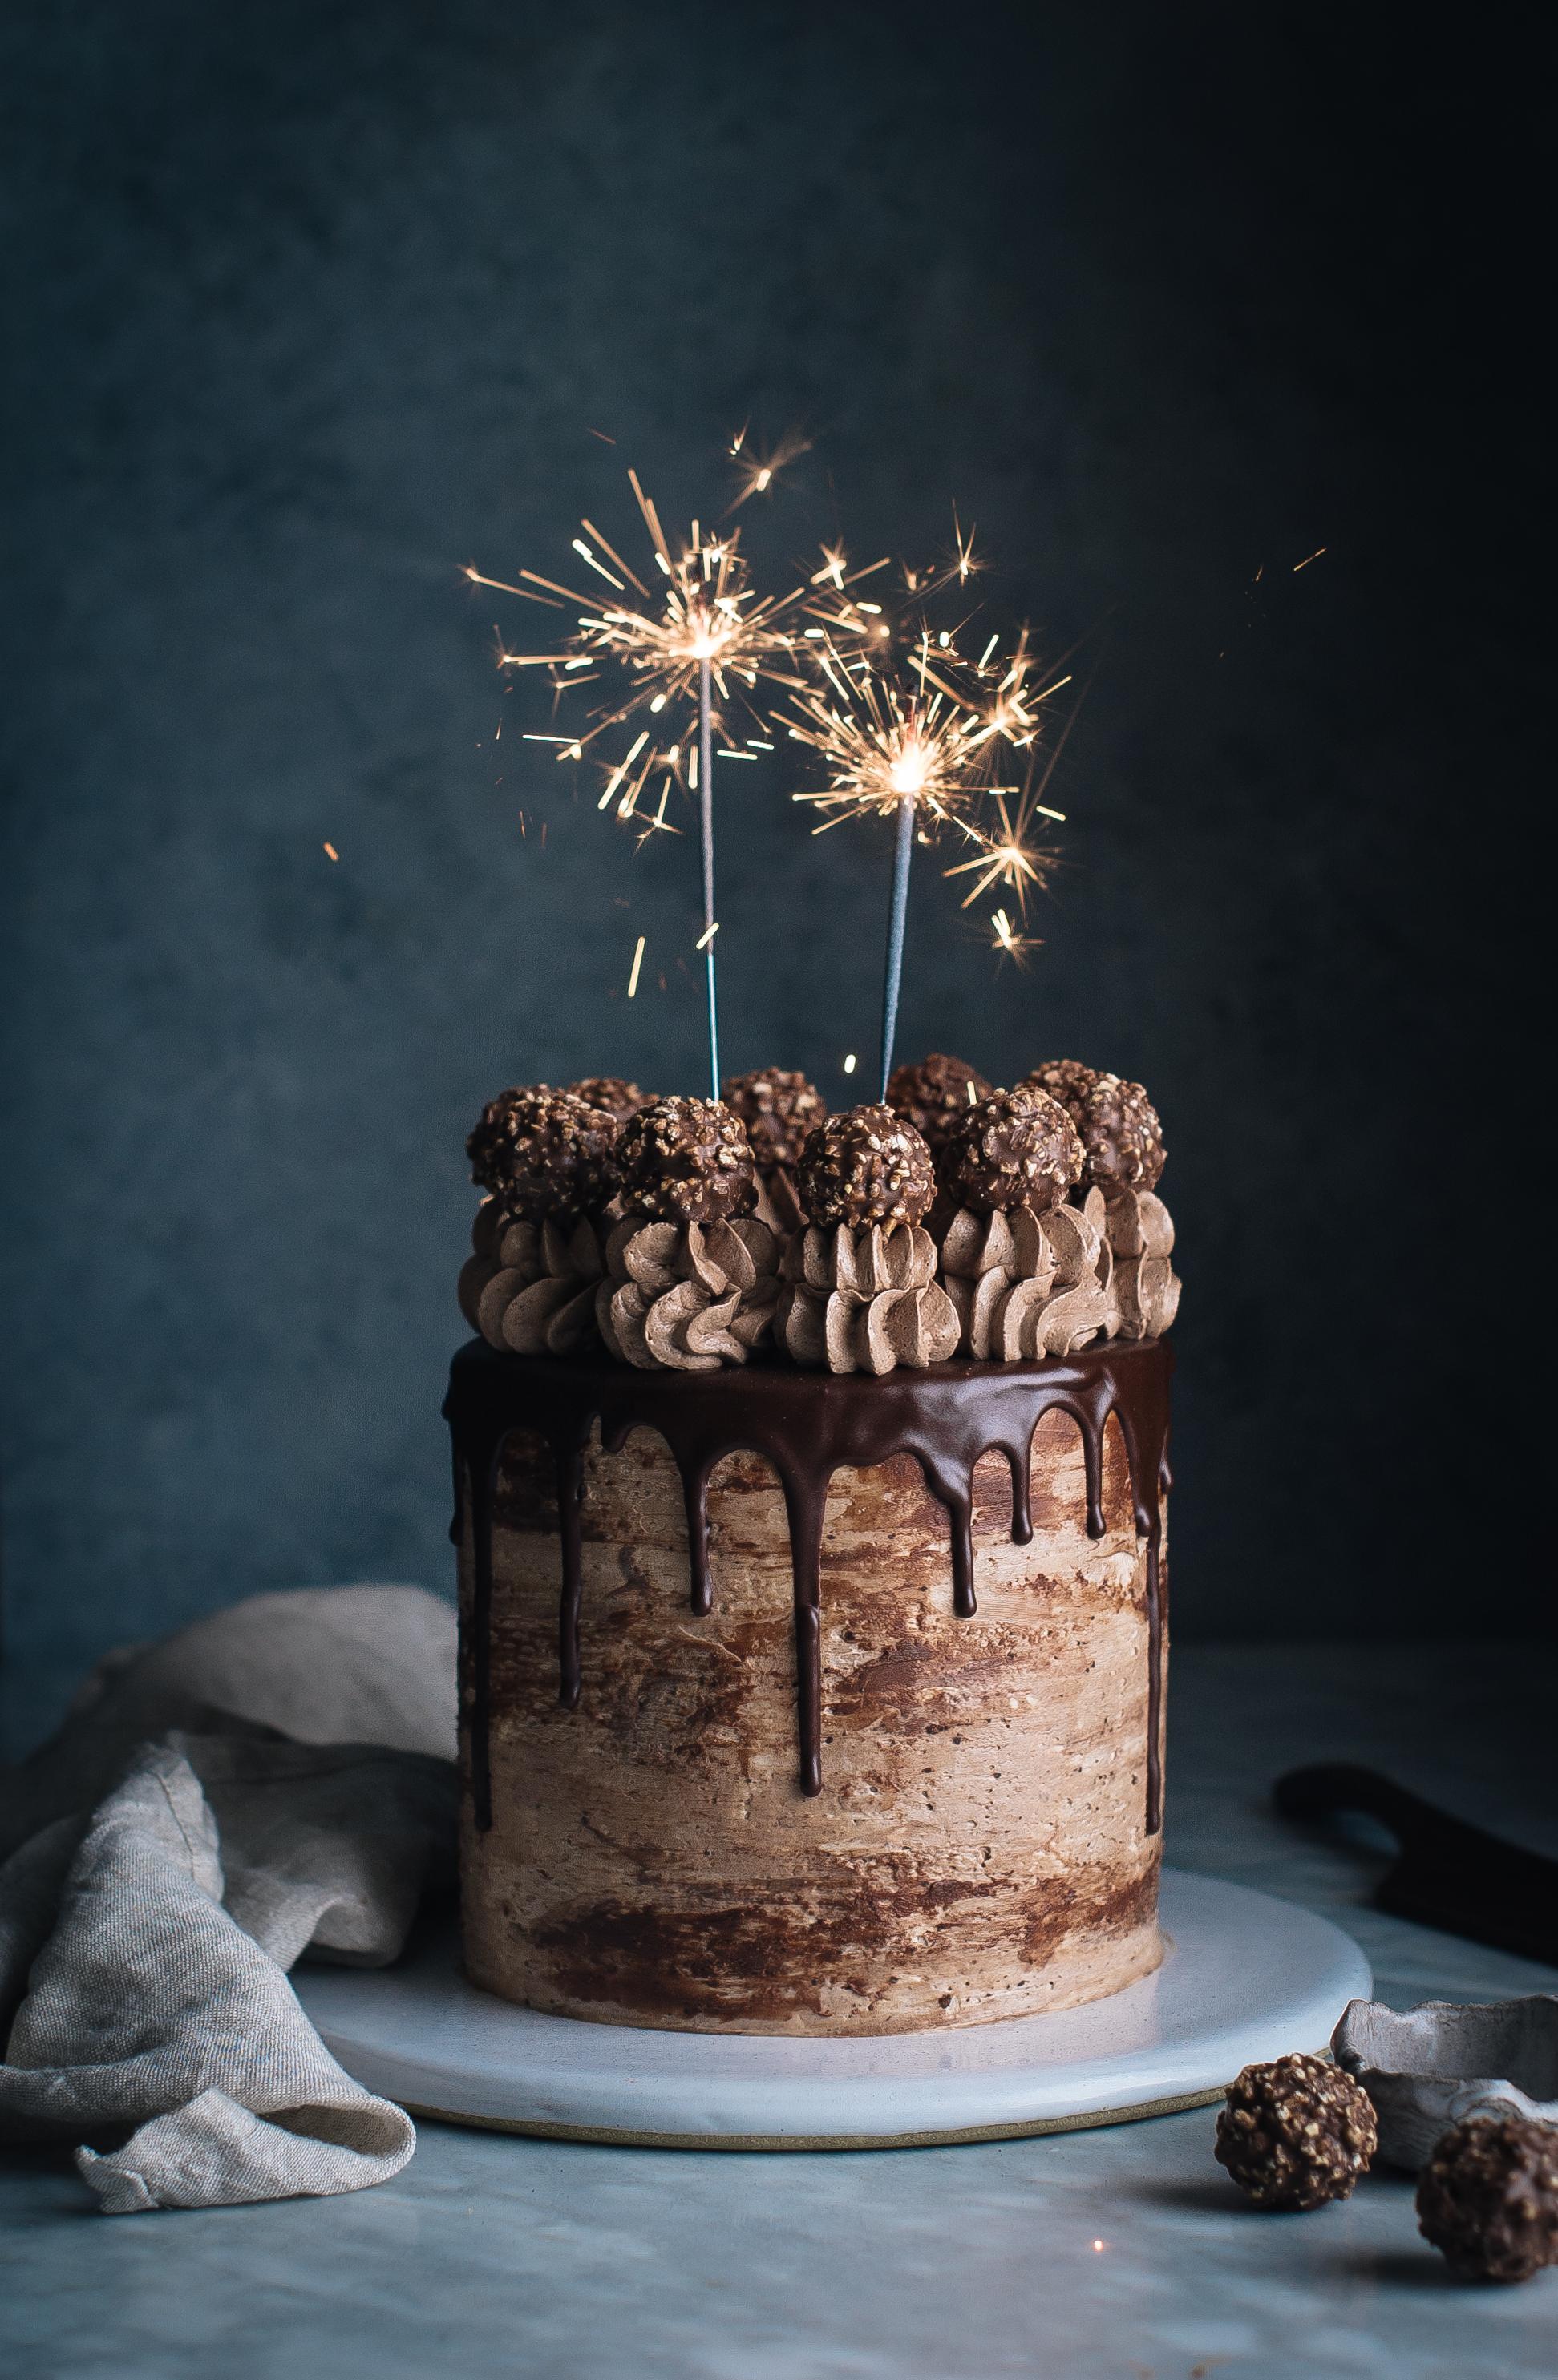 Chocolate Marzipan Cake Covering